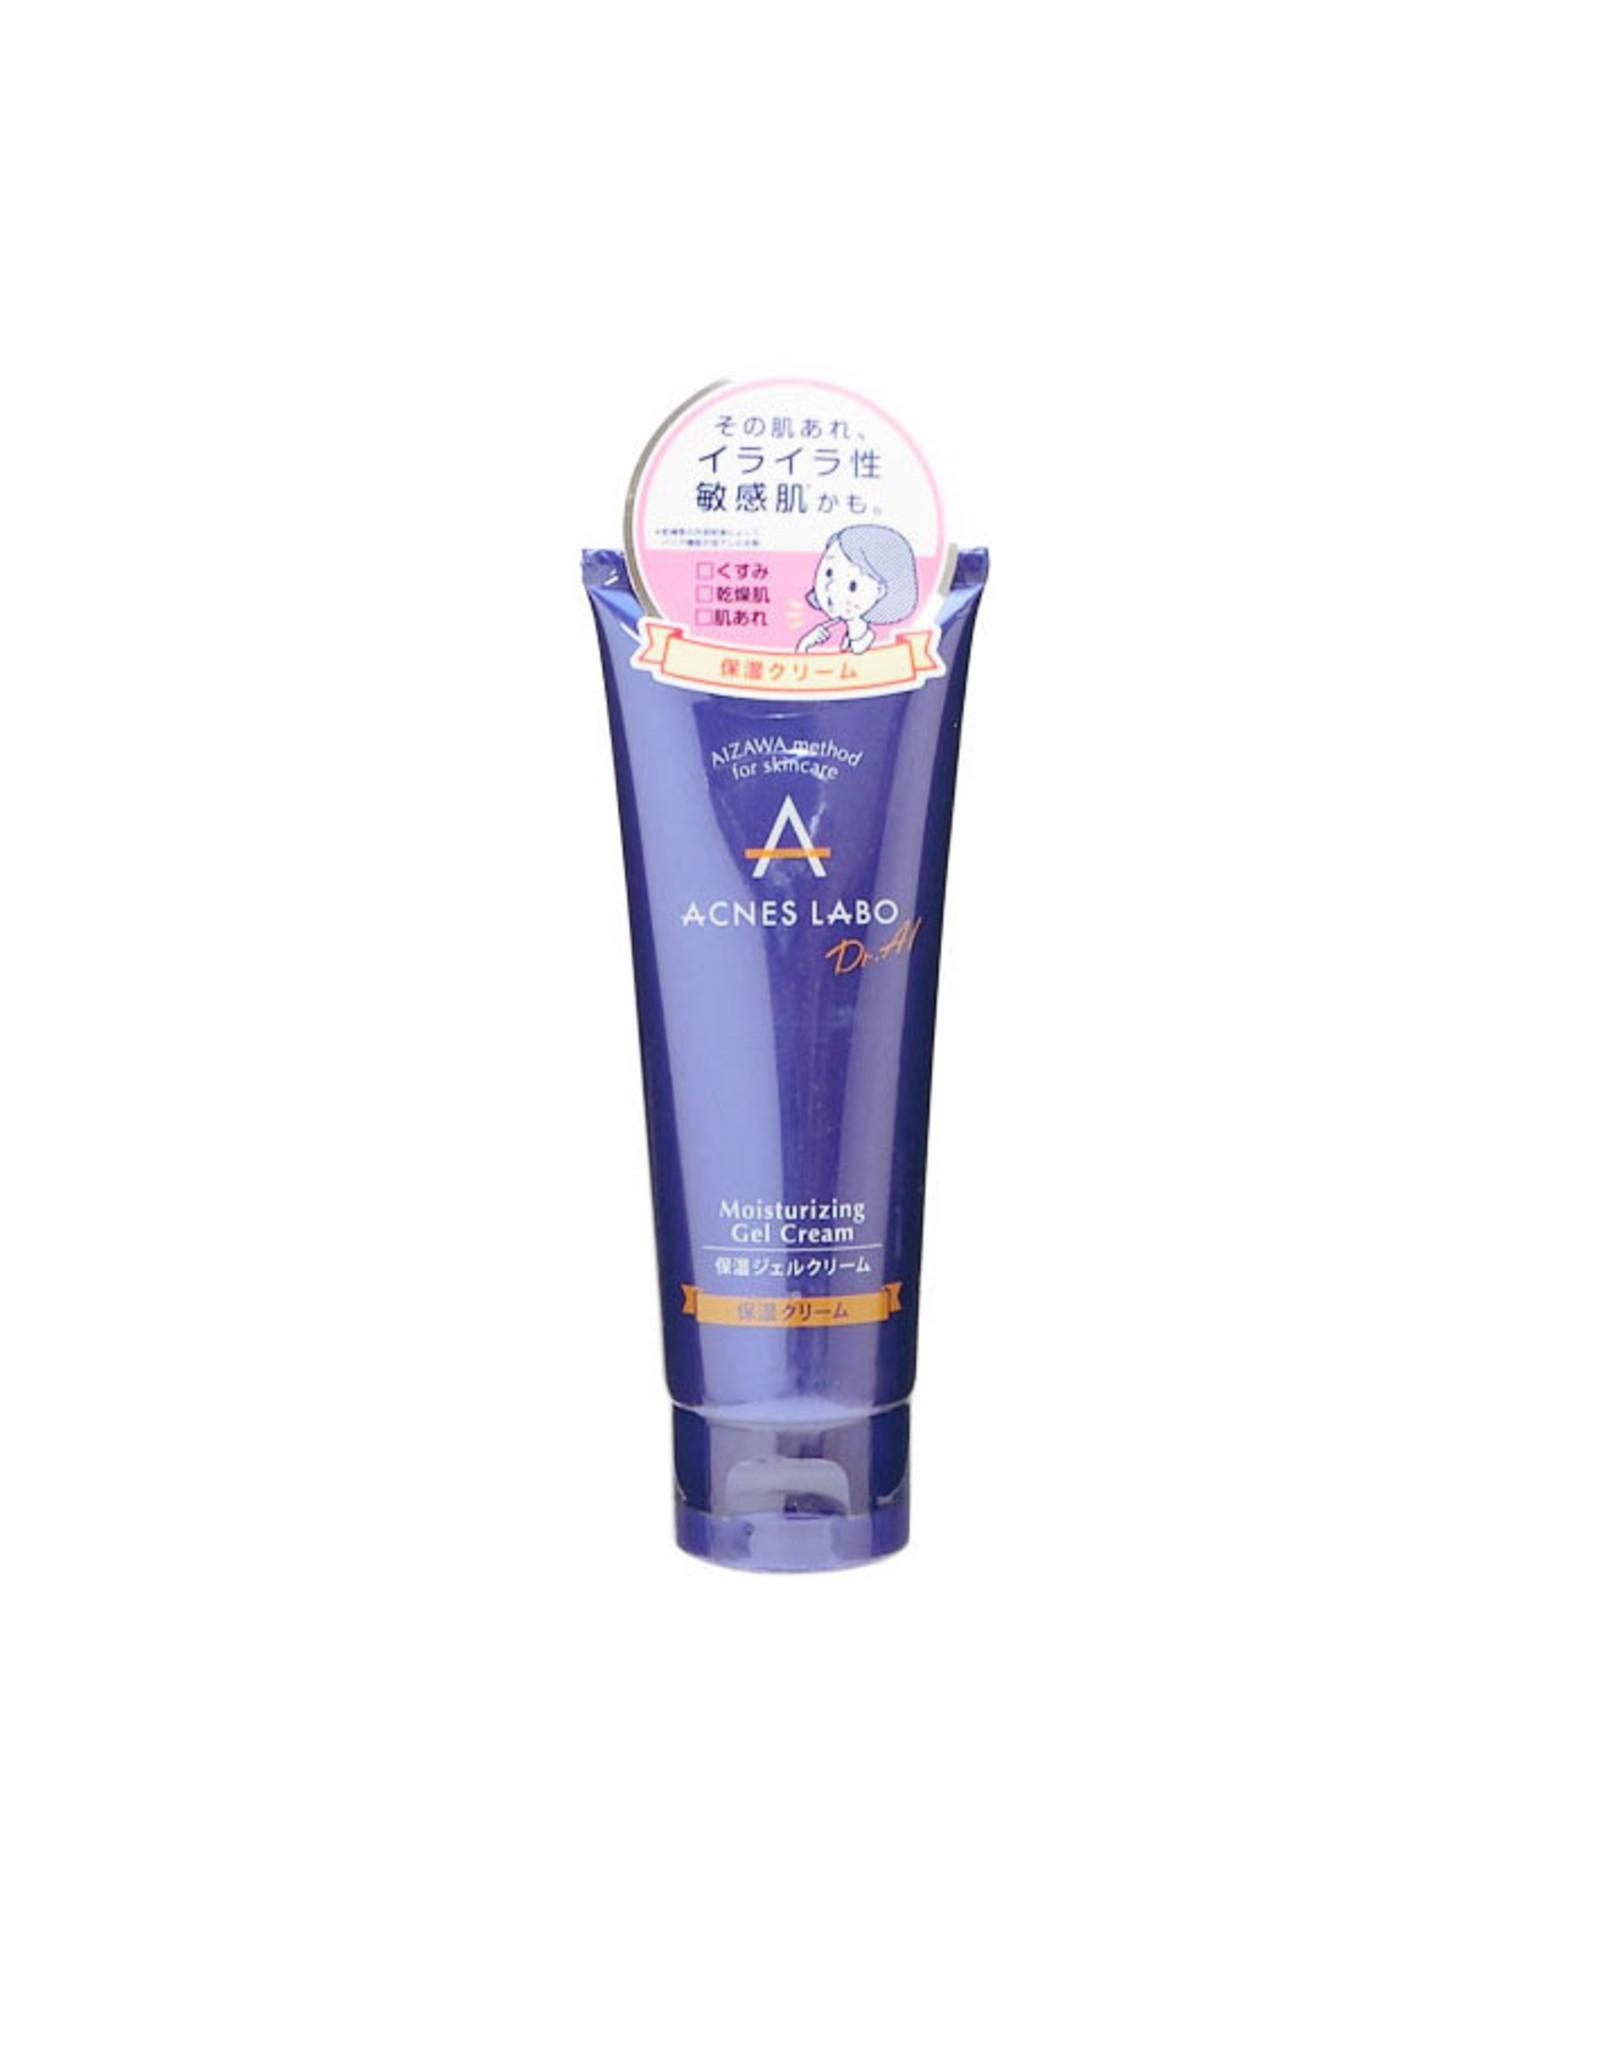 Acnes Labo Moisturizing Gel Cream 60g